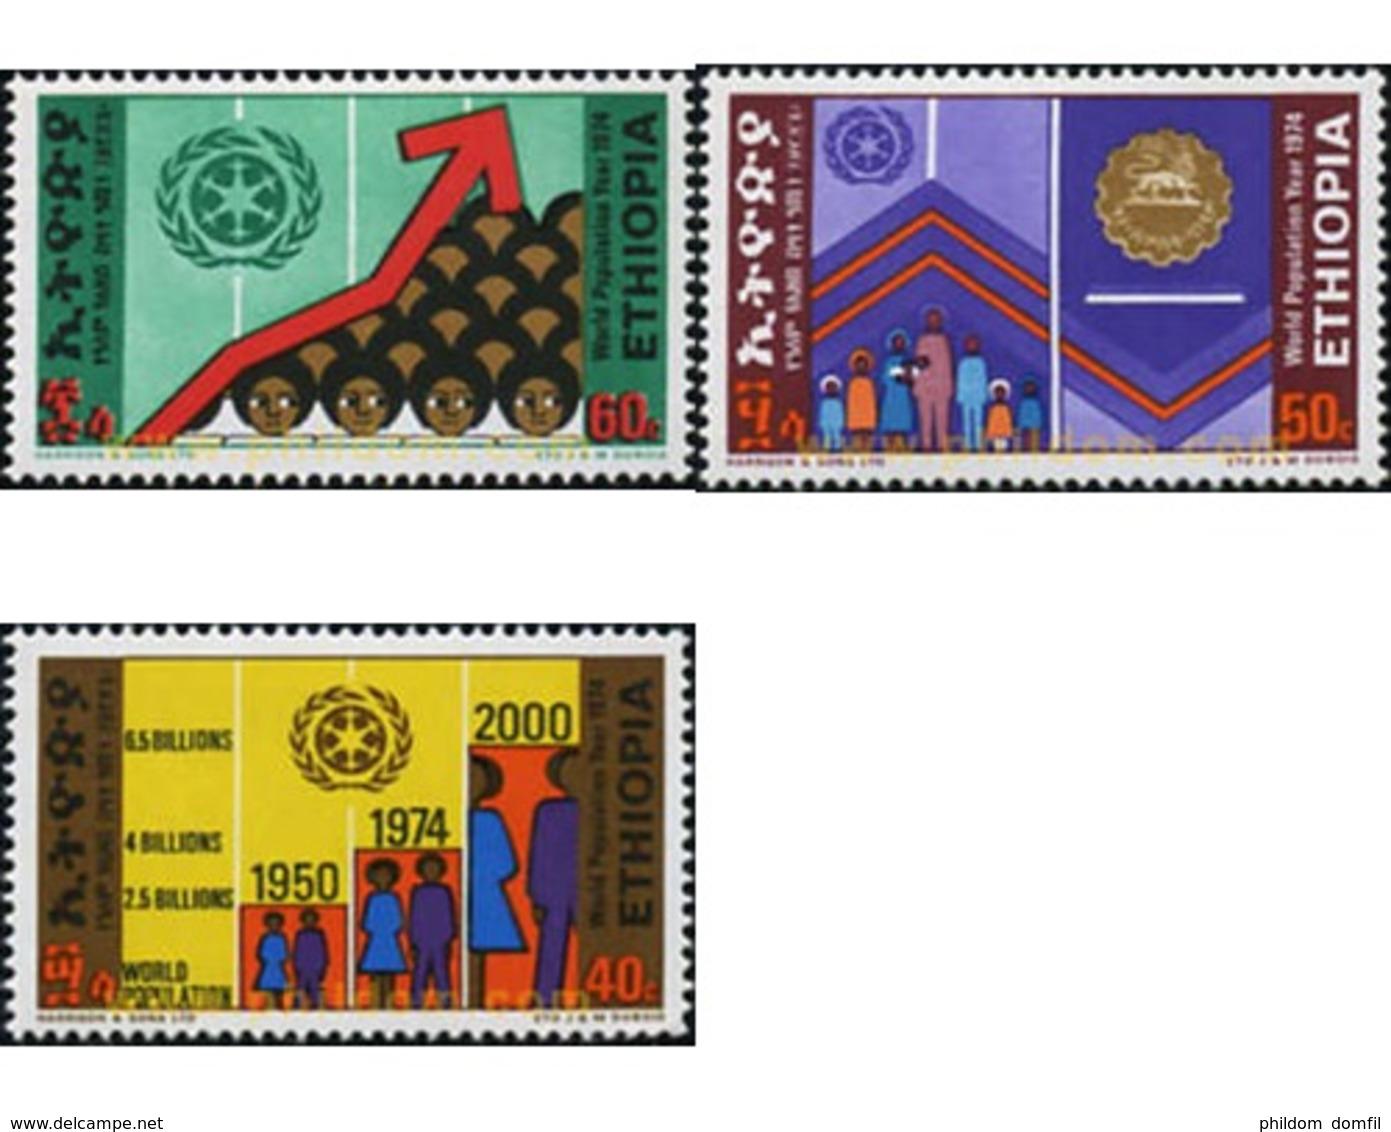 Ref. 312071 * MNH * - ETHIOPIA. 1974. POBLACION MUNDIAL - Ethiopie